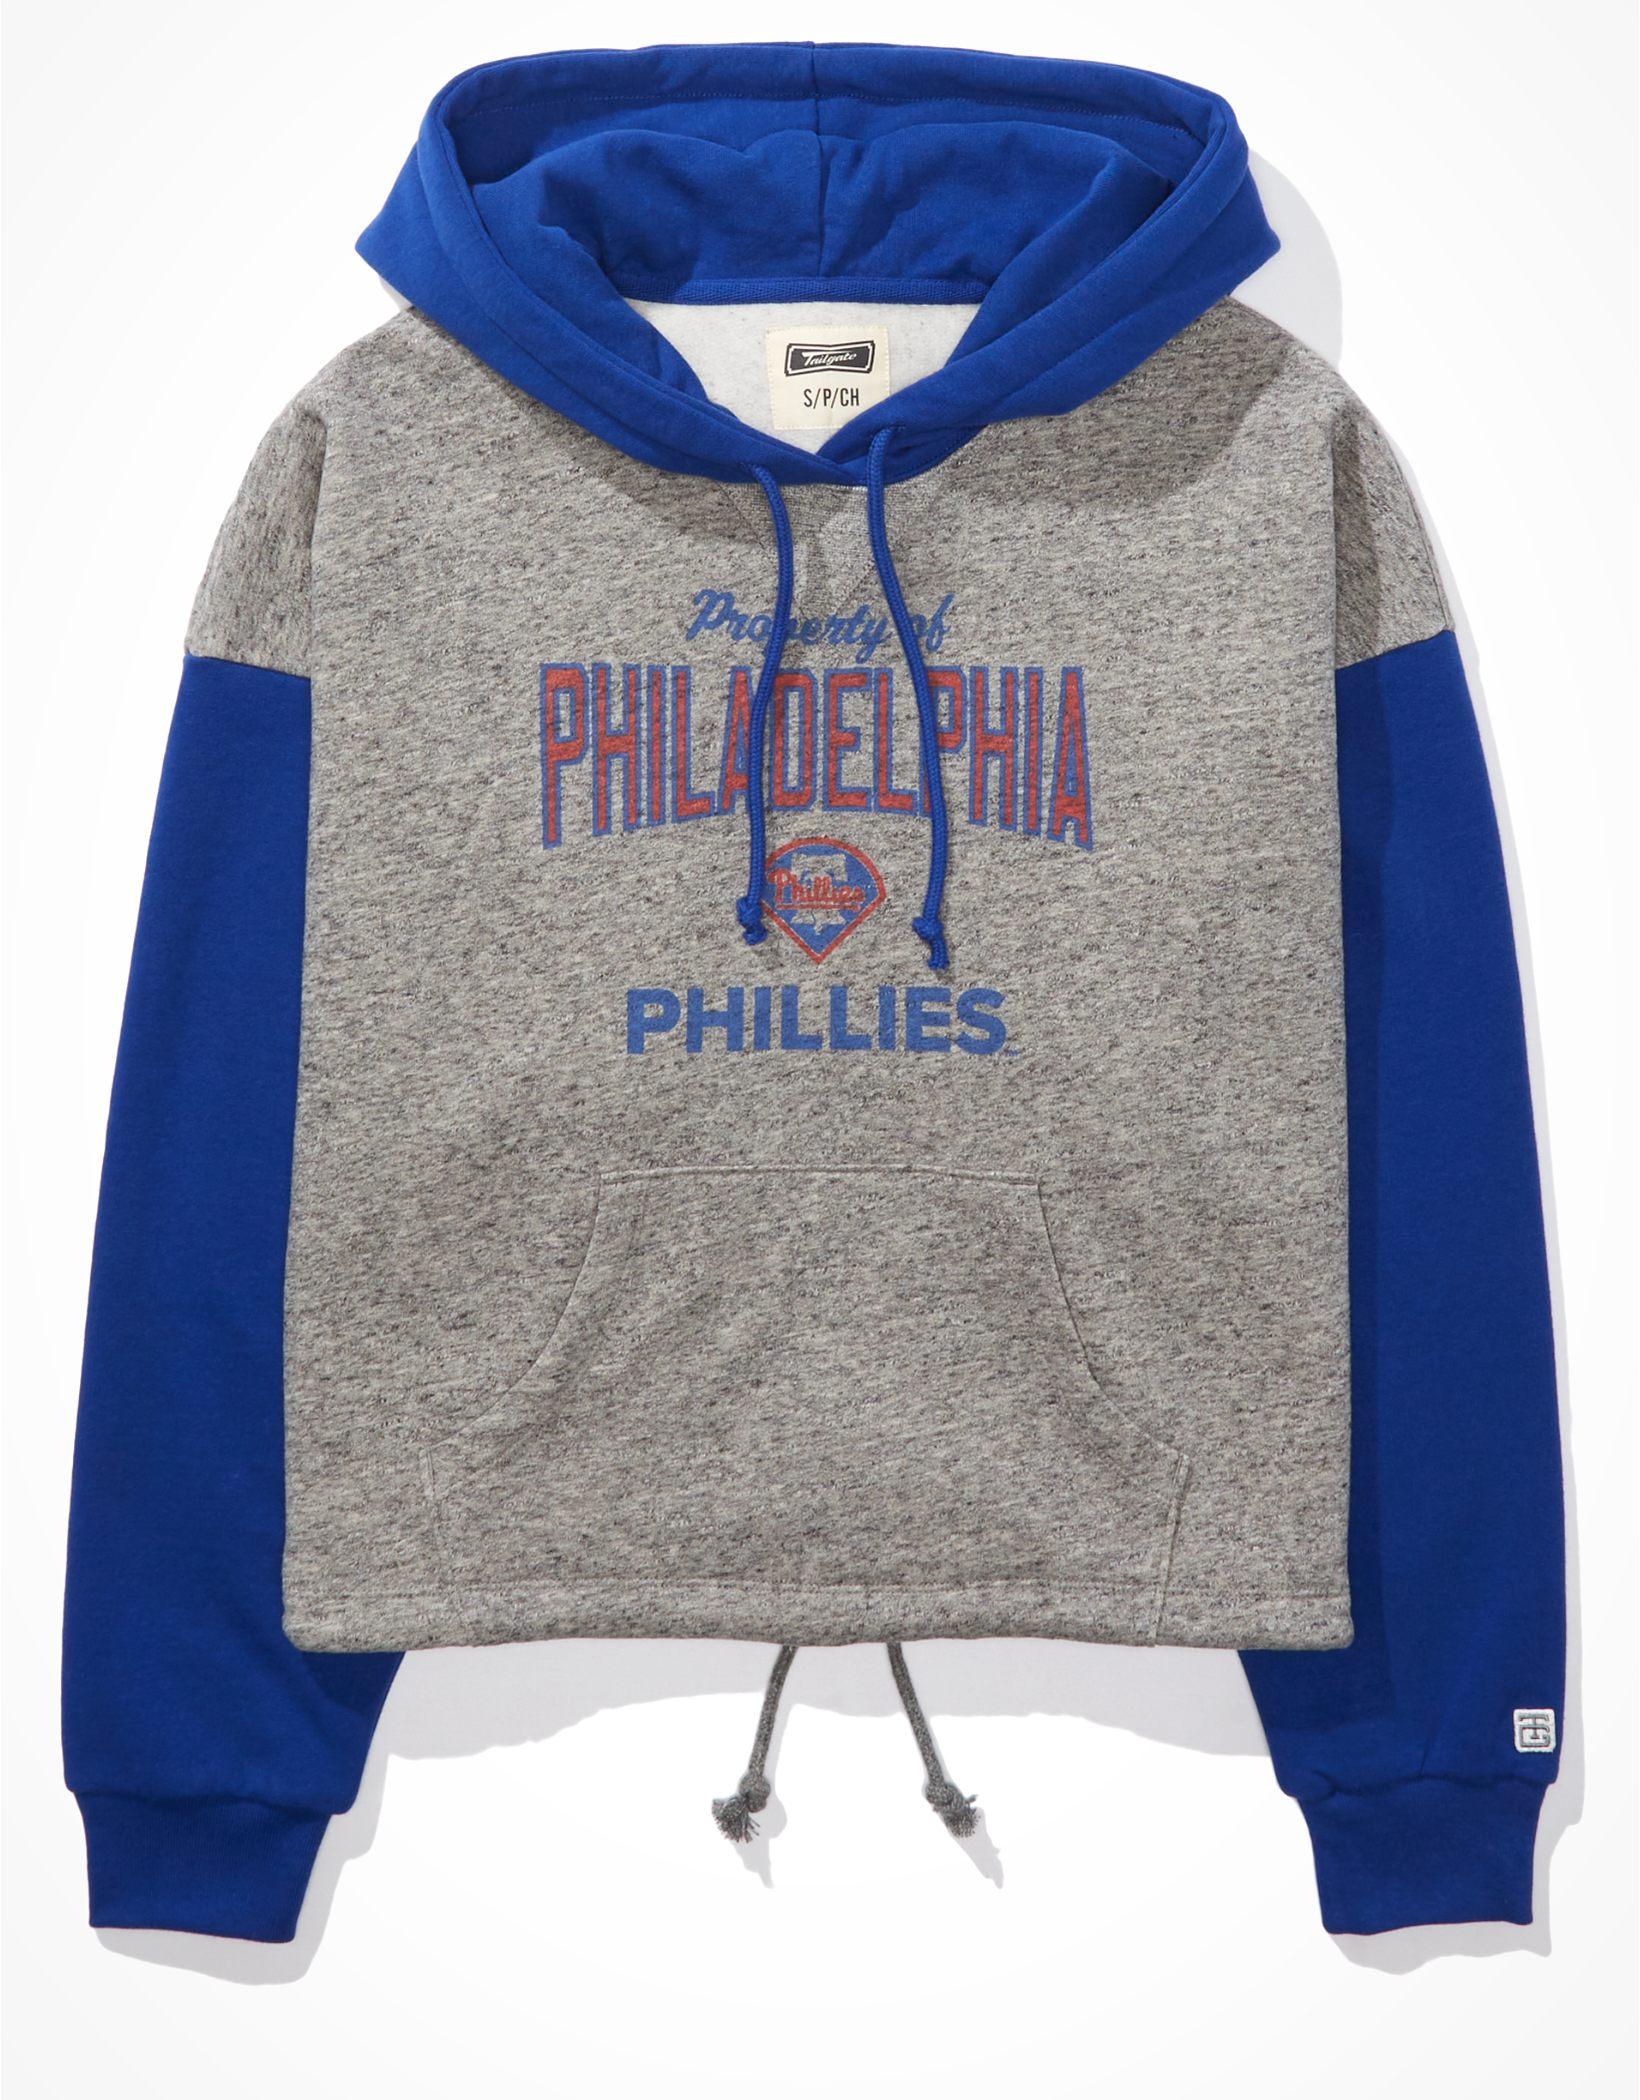 Tailgate Women's Philadelphia Phillies Colorblock Cropped Hoodie